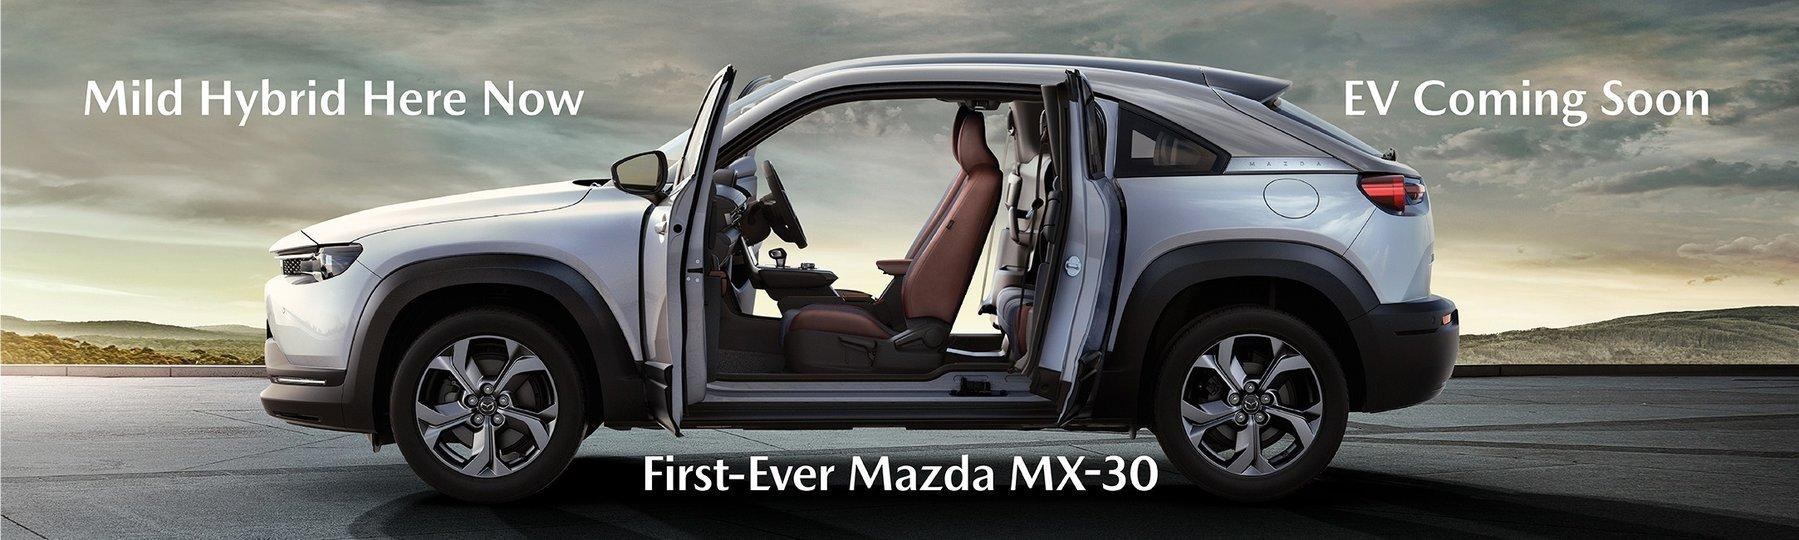 Mild Hybrid Here Now! EV Coming Soon.